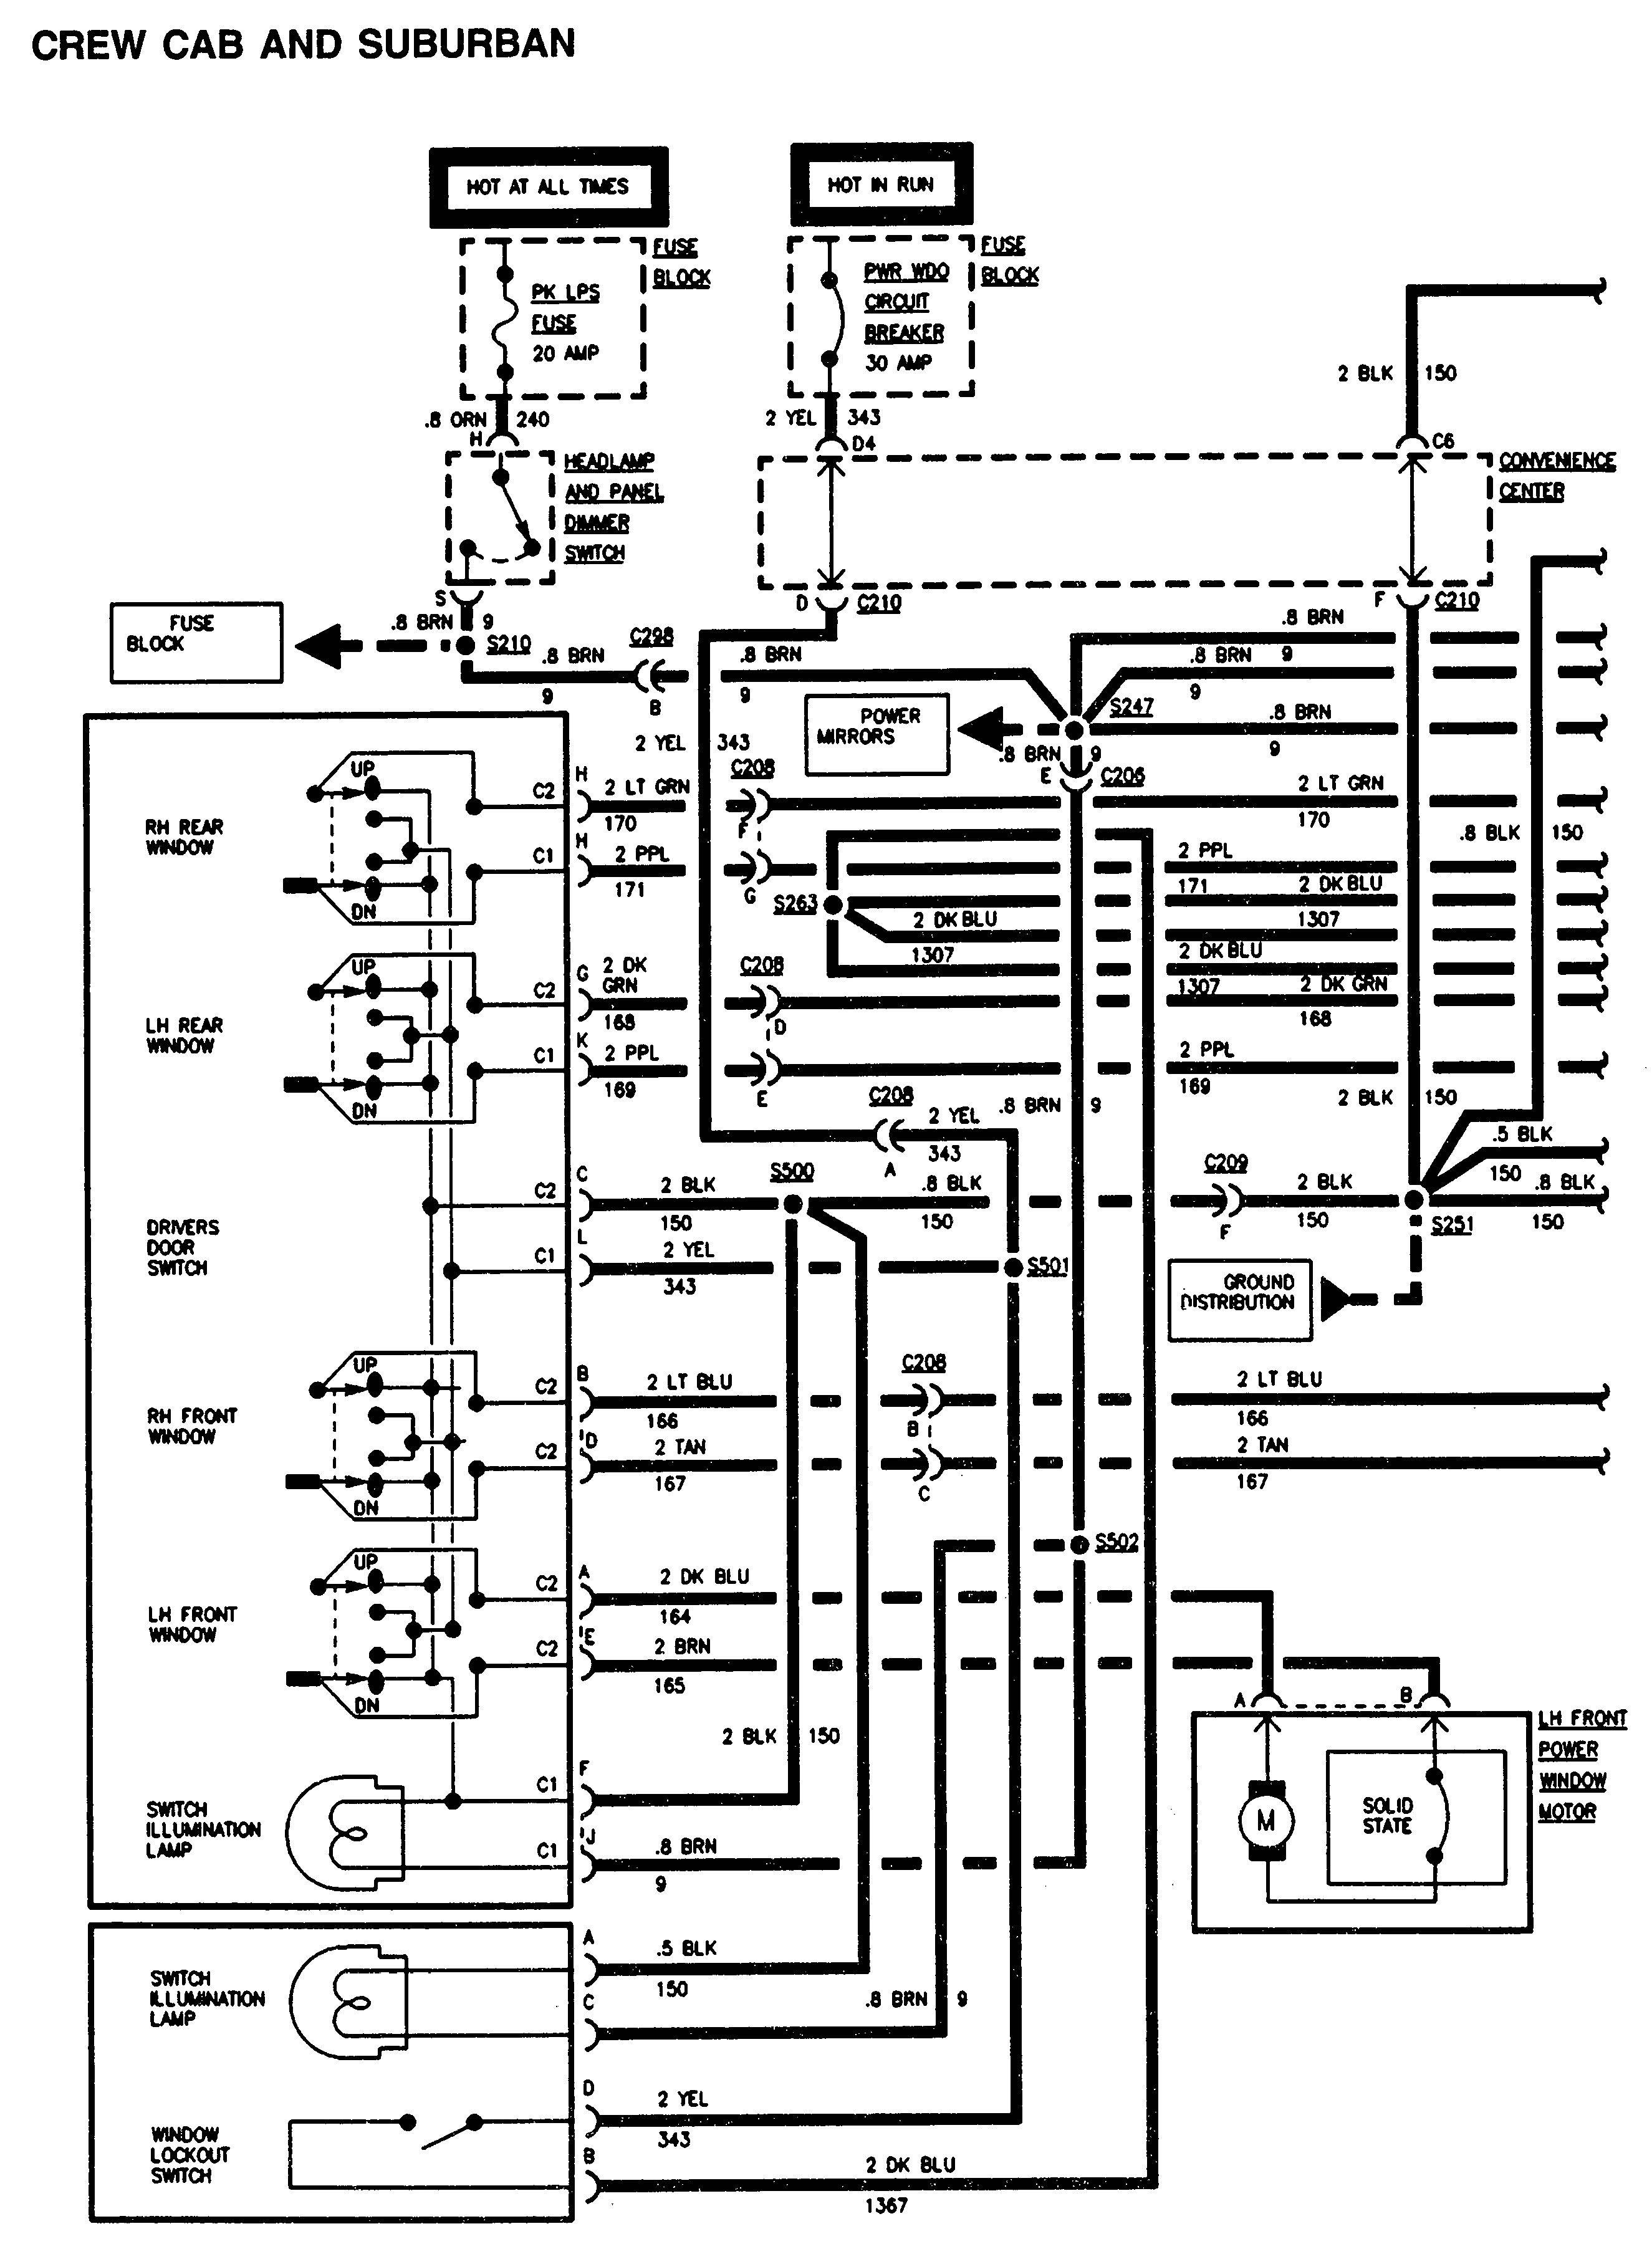 2004 Gmc Sierra 6.0 Tcm Wiring Diagram] 2003 Sierra 1500 Wiring Diagram Full Version Hd